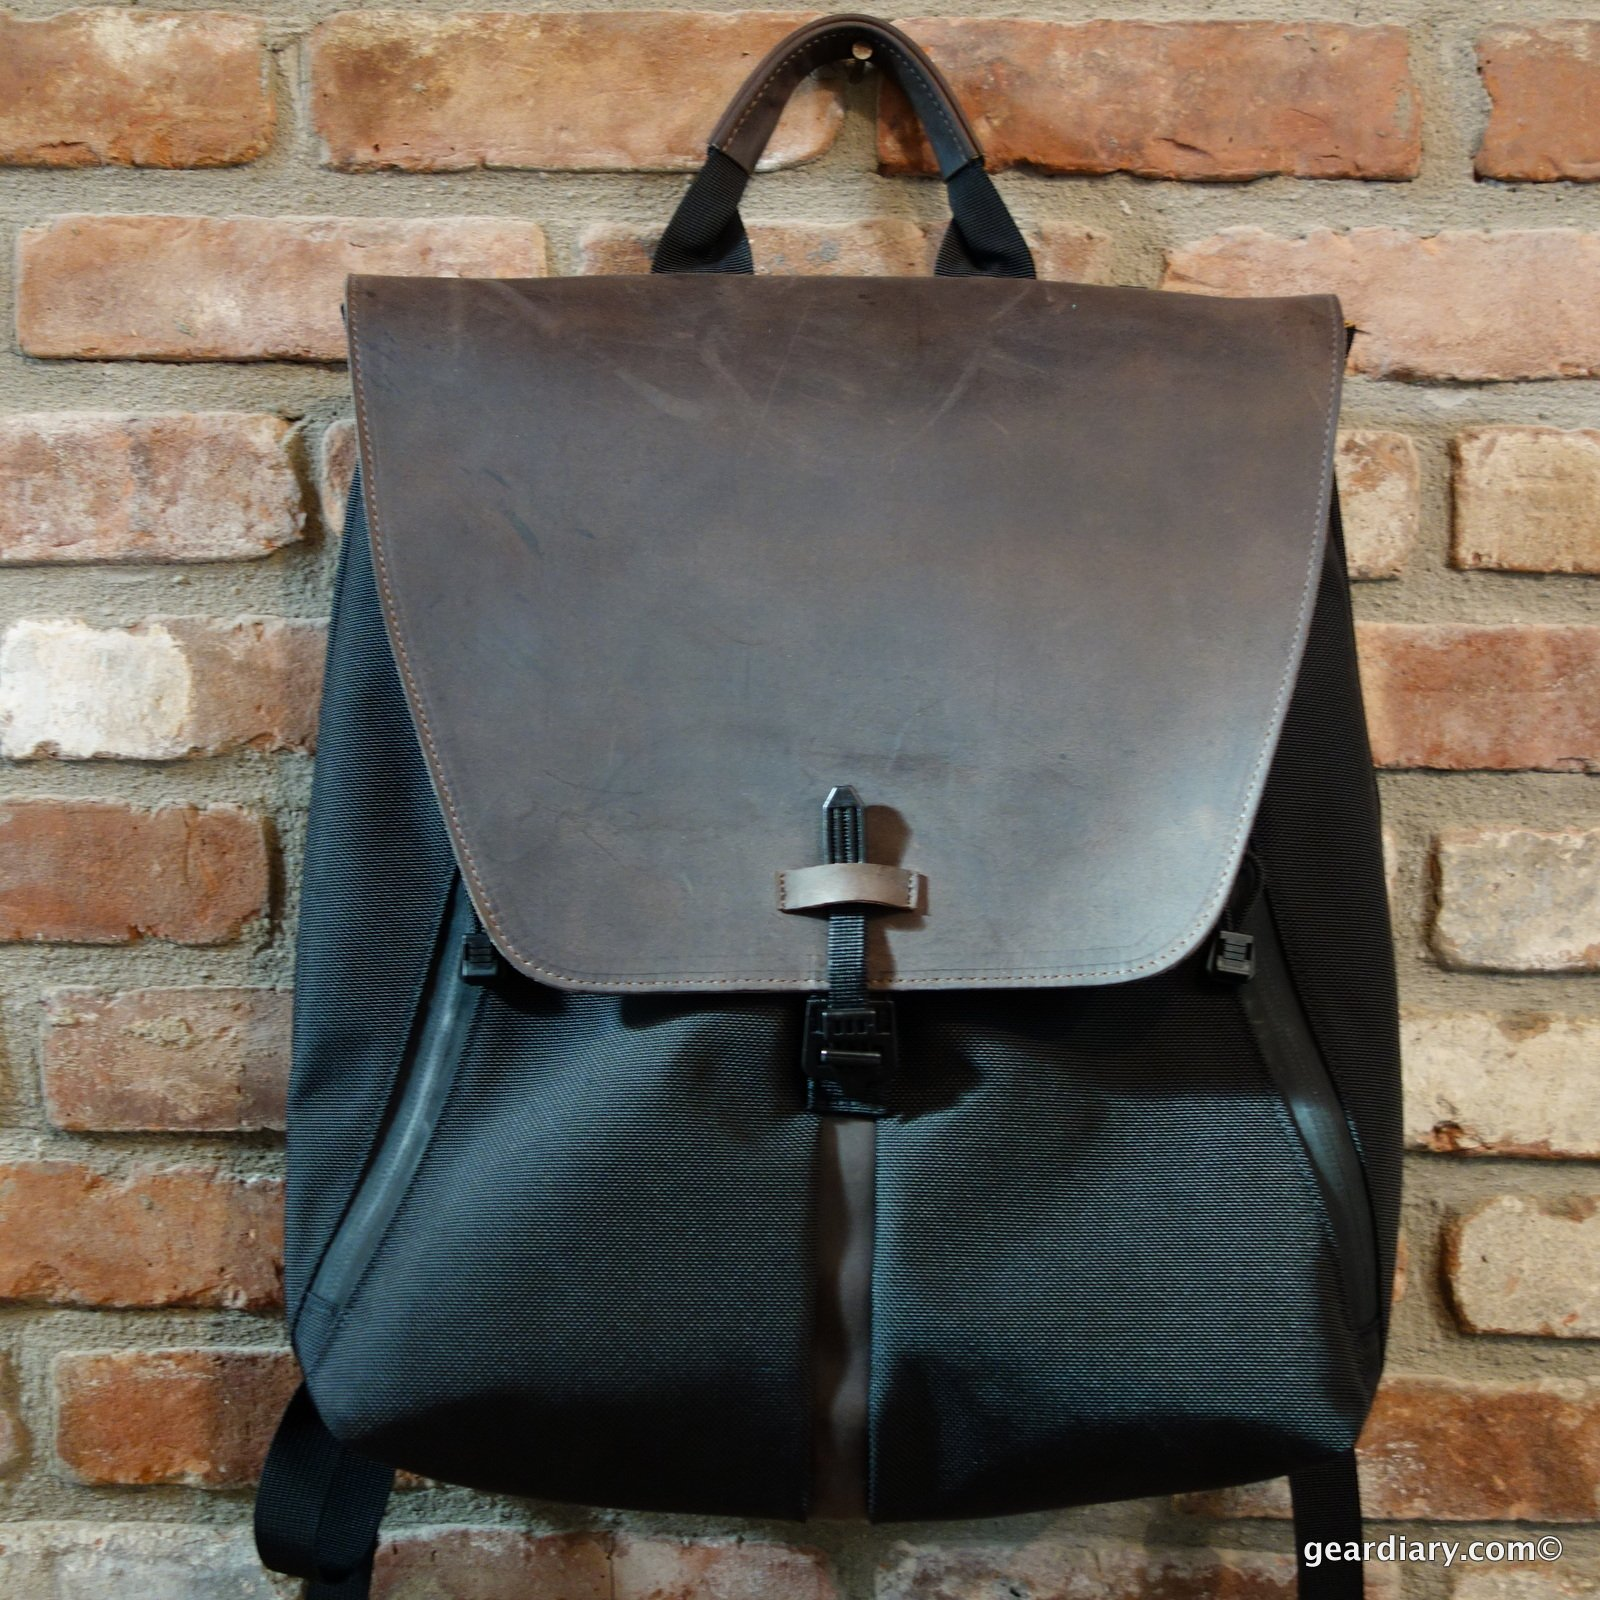 WaterField Laptop Bags Gear Bags